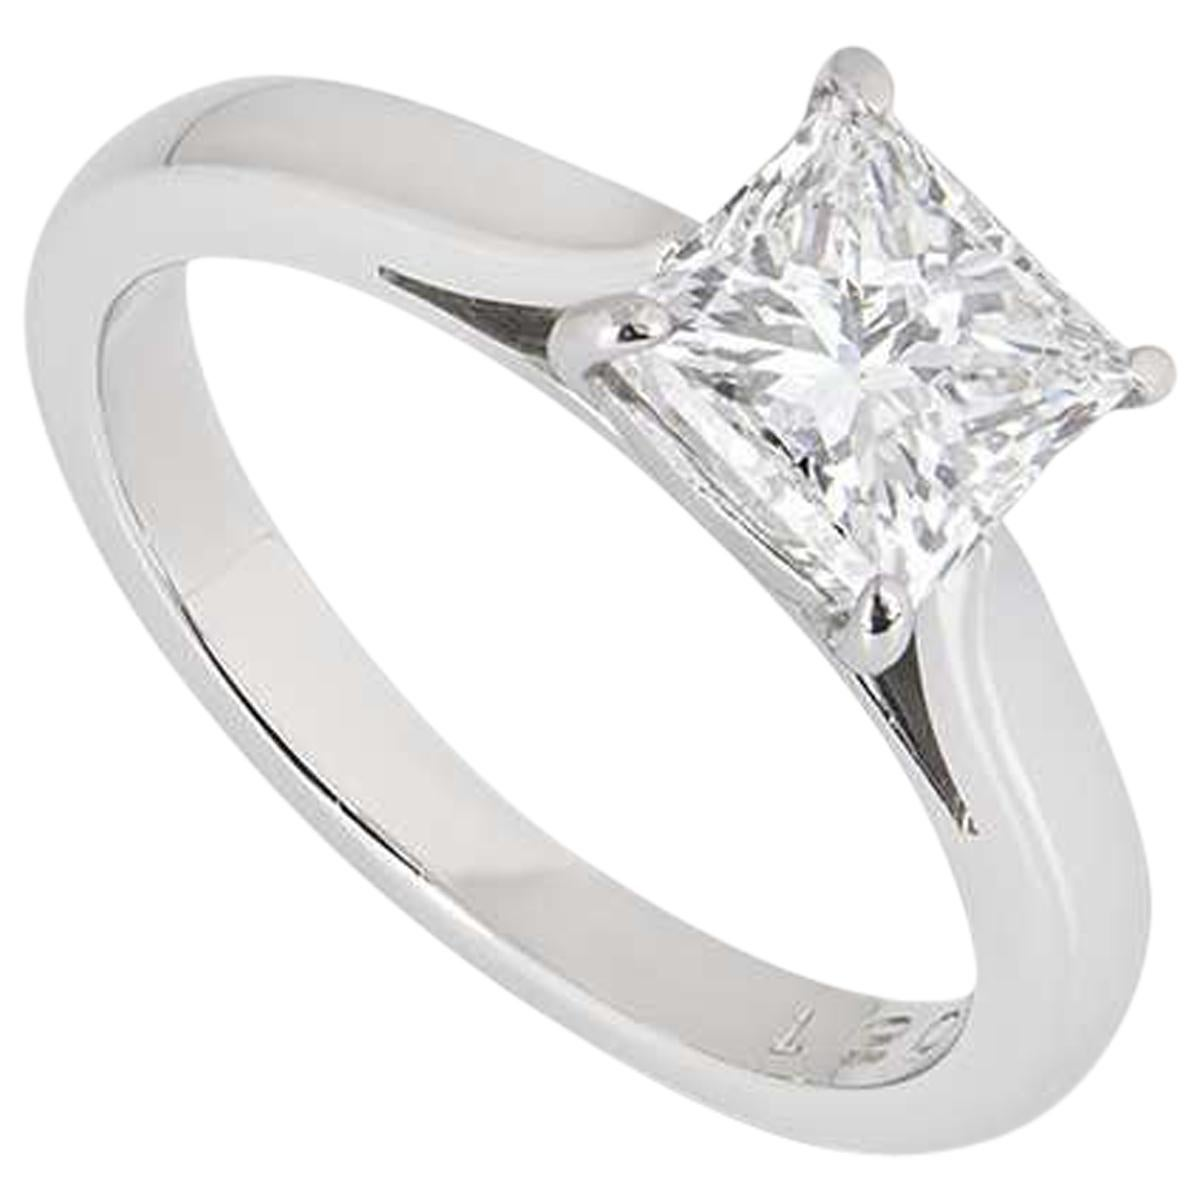 GIA Certified Platinum Princess Cut Diamond Engagement Ring 1.51 Carat F/VS2